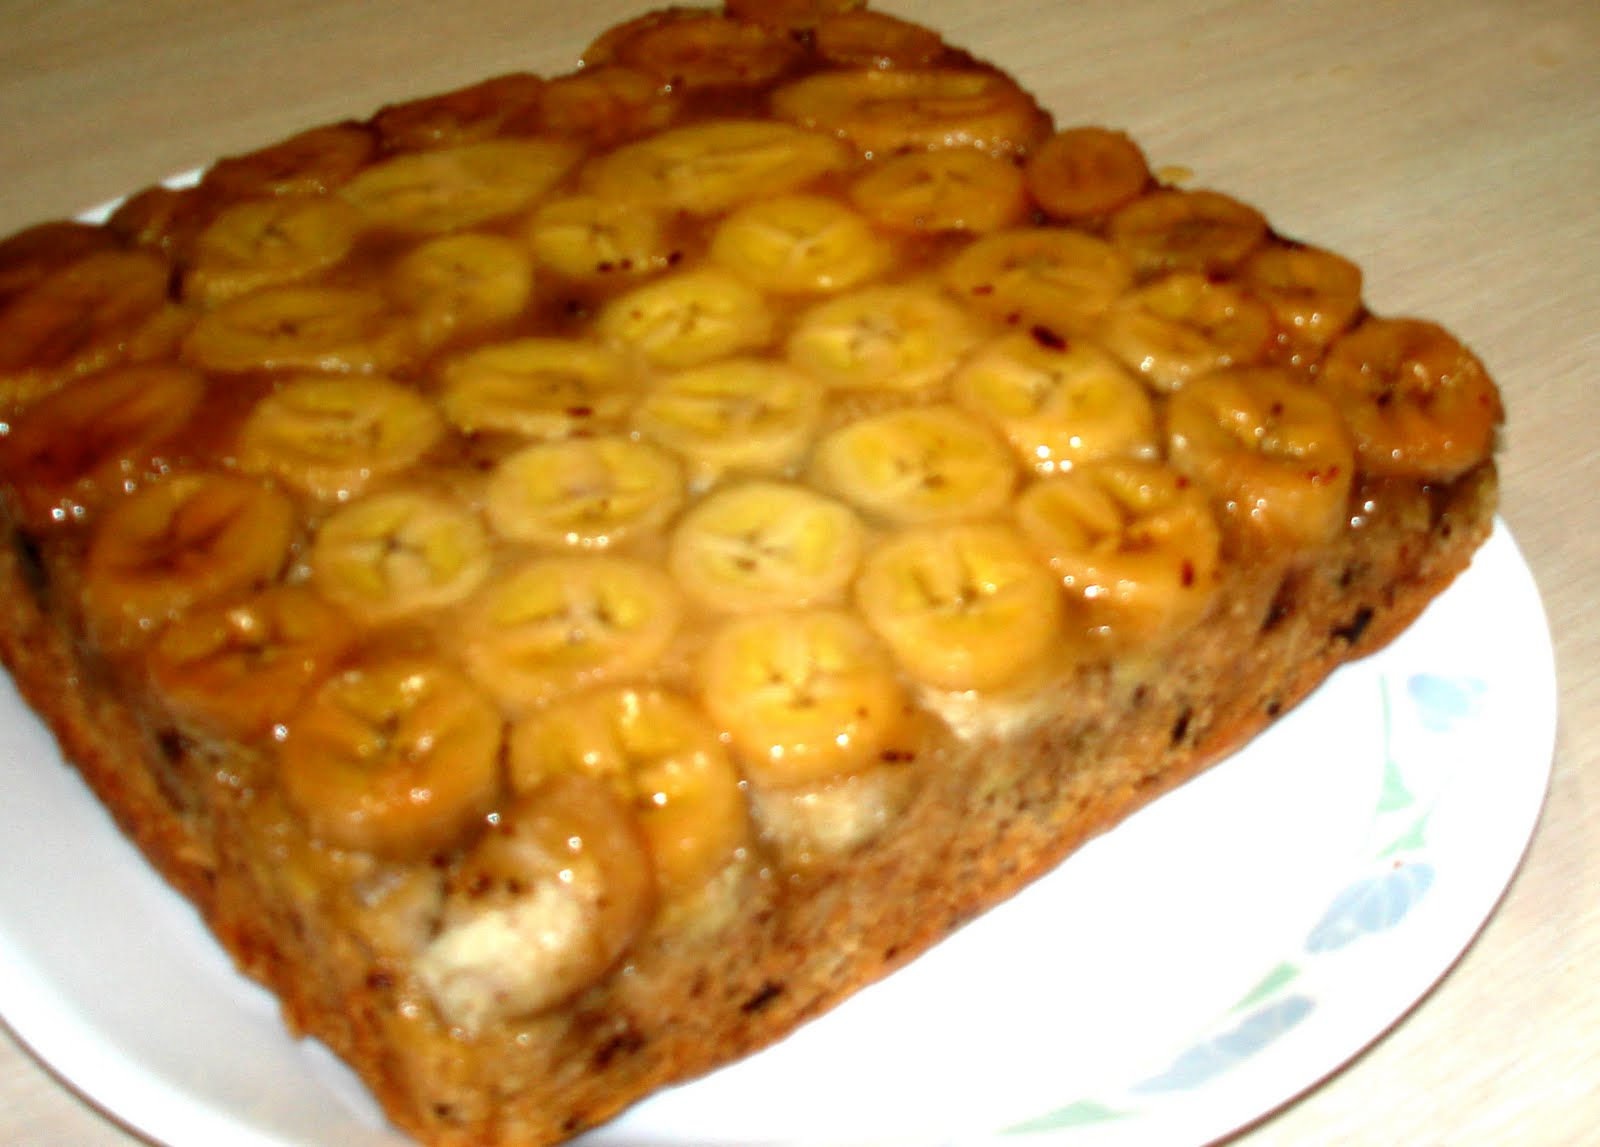 ... cake pumpkin spice cake with chocolate chips upside down banana coffee